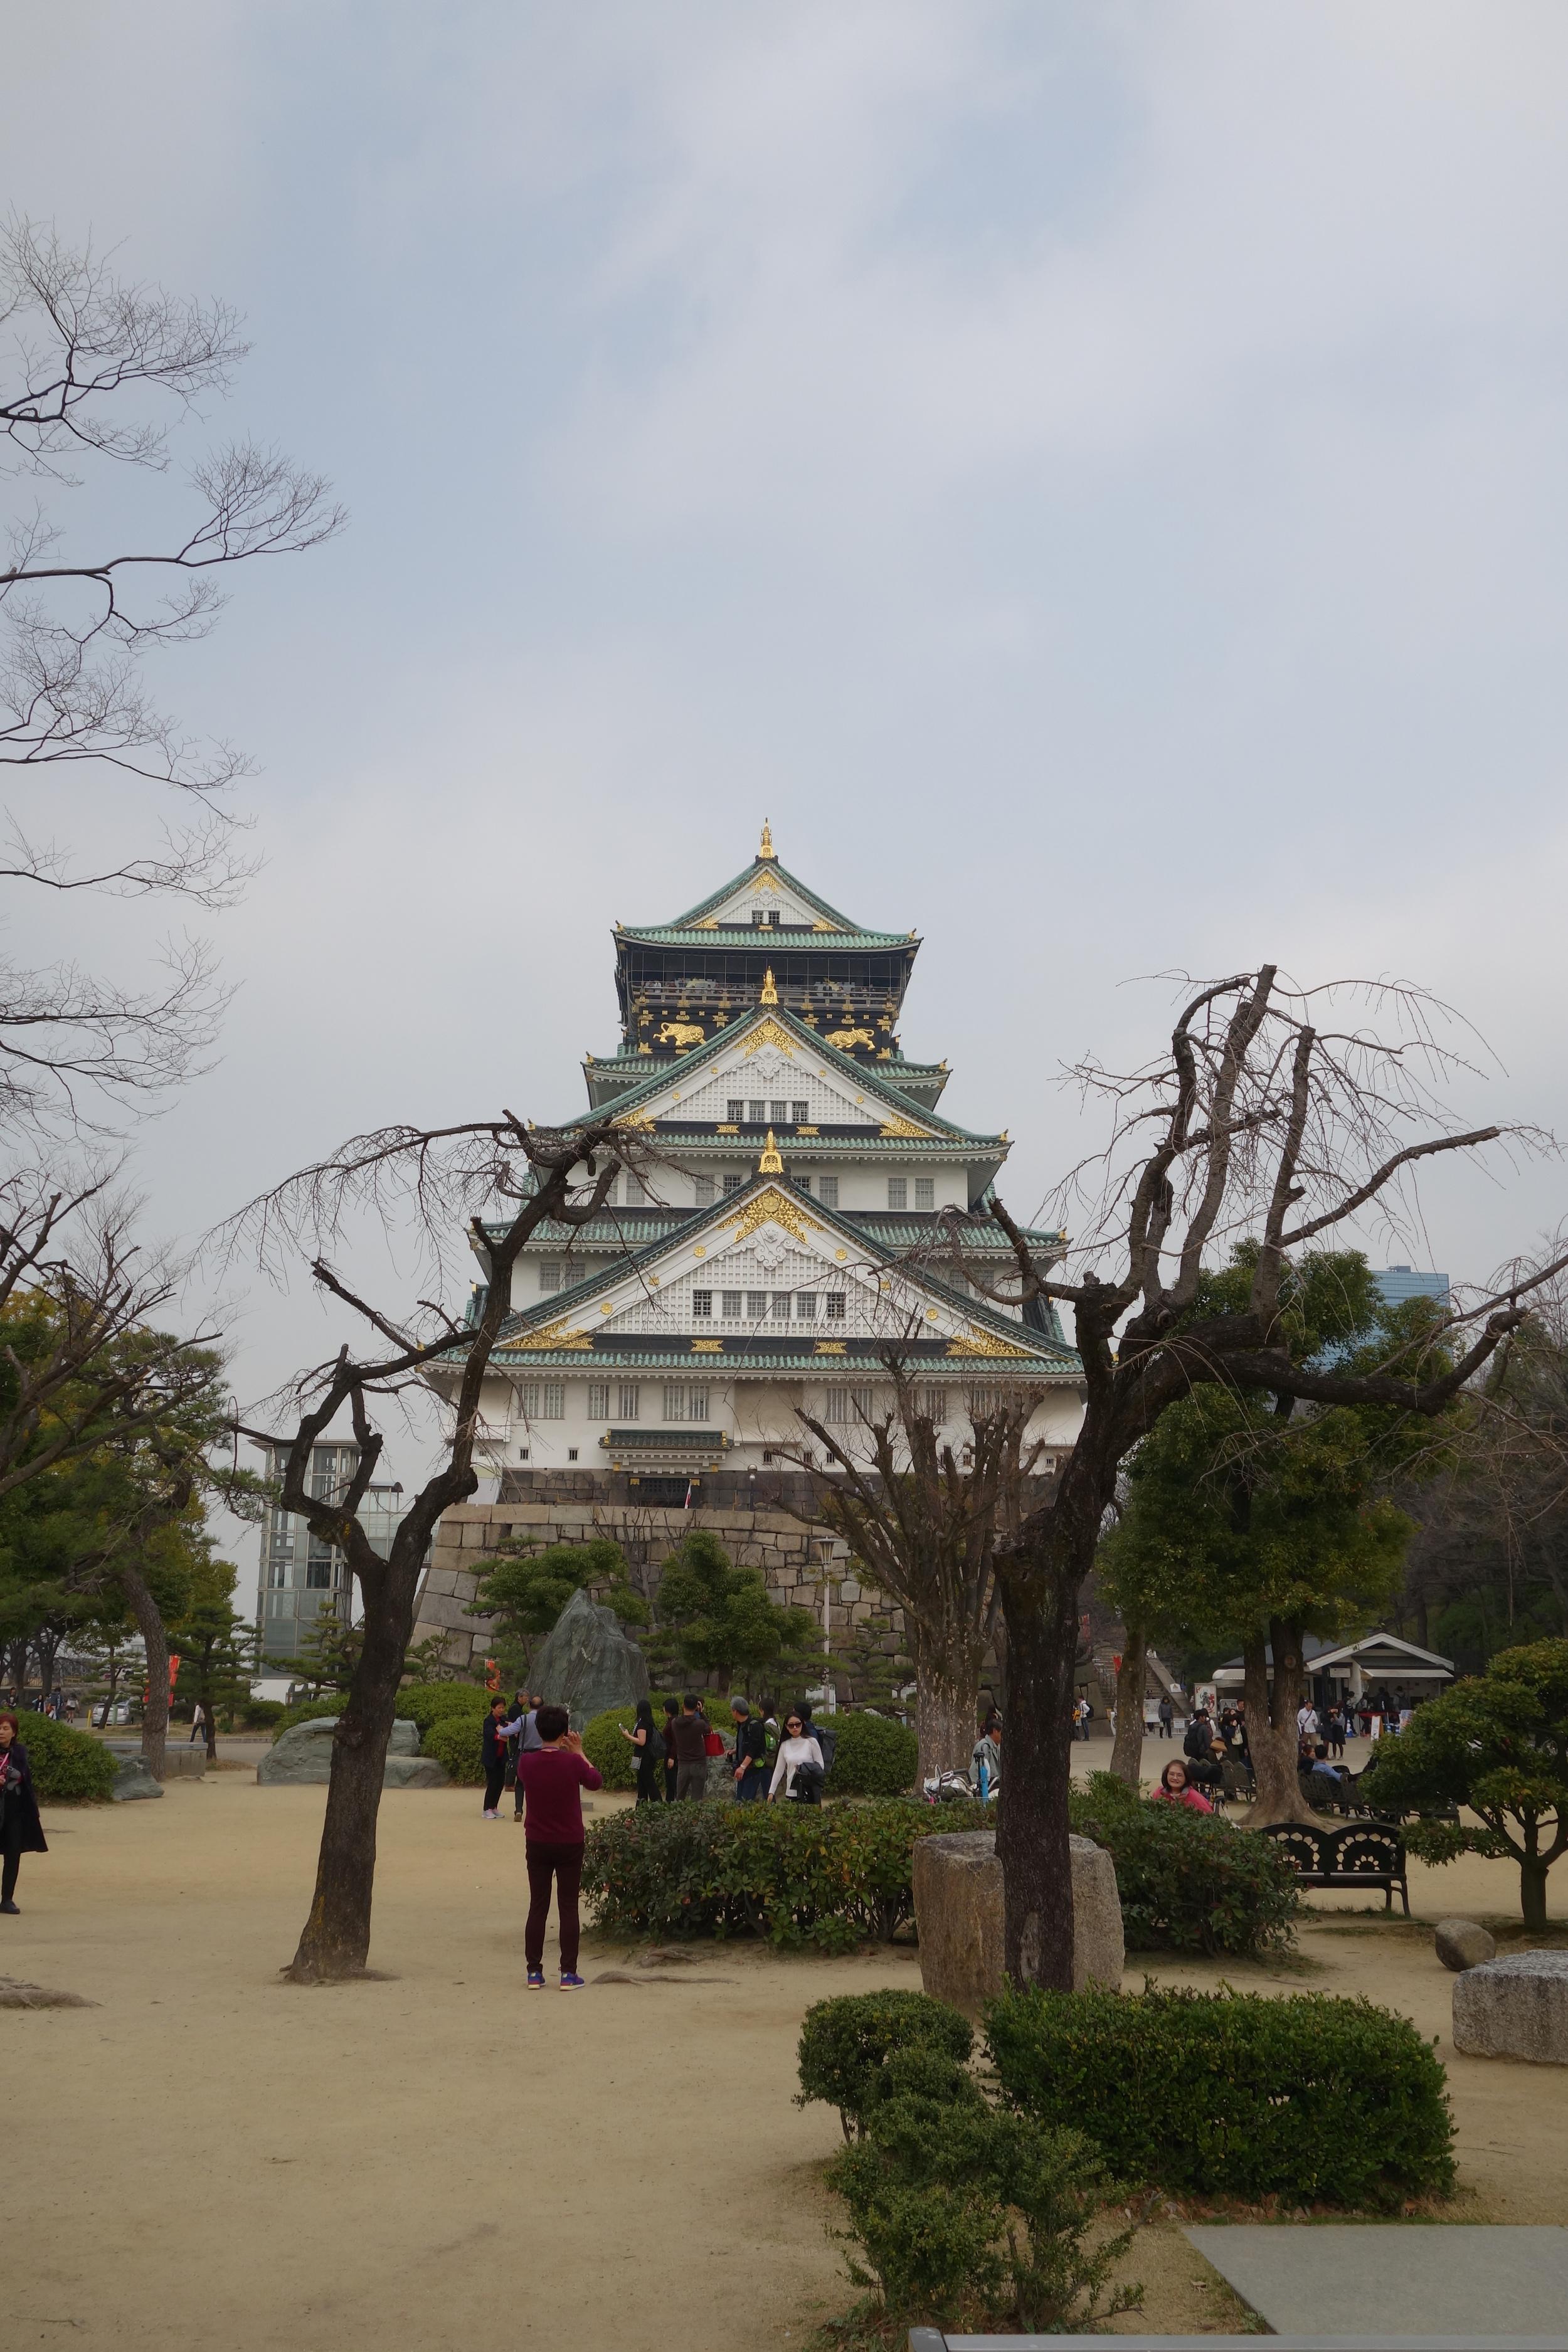 Het kasteel van Osaka